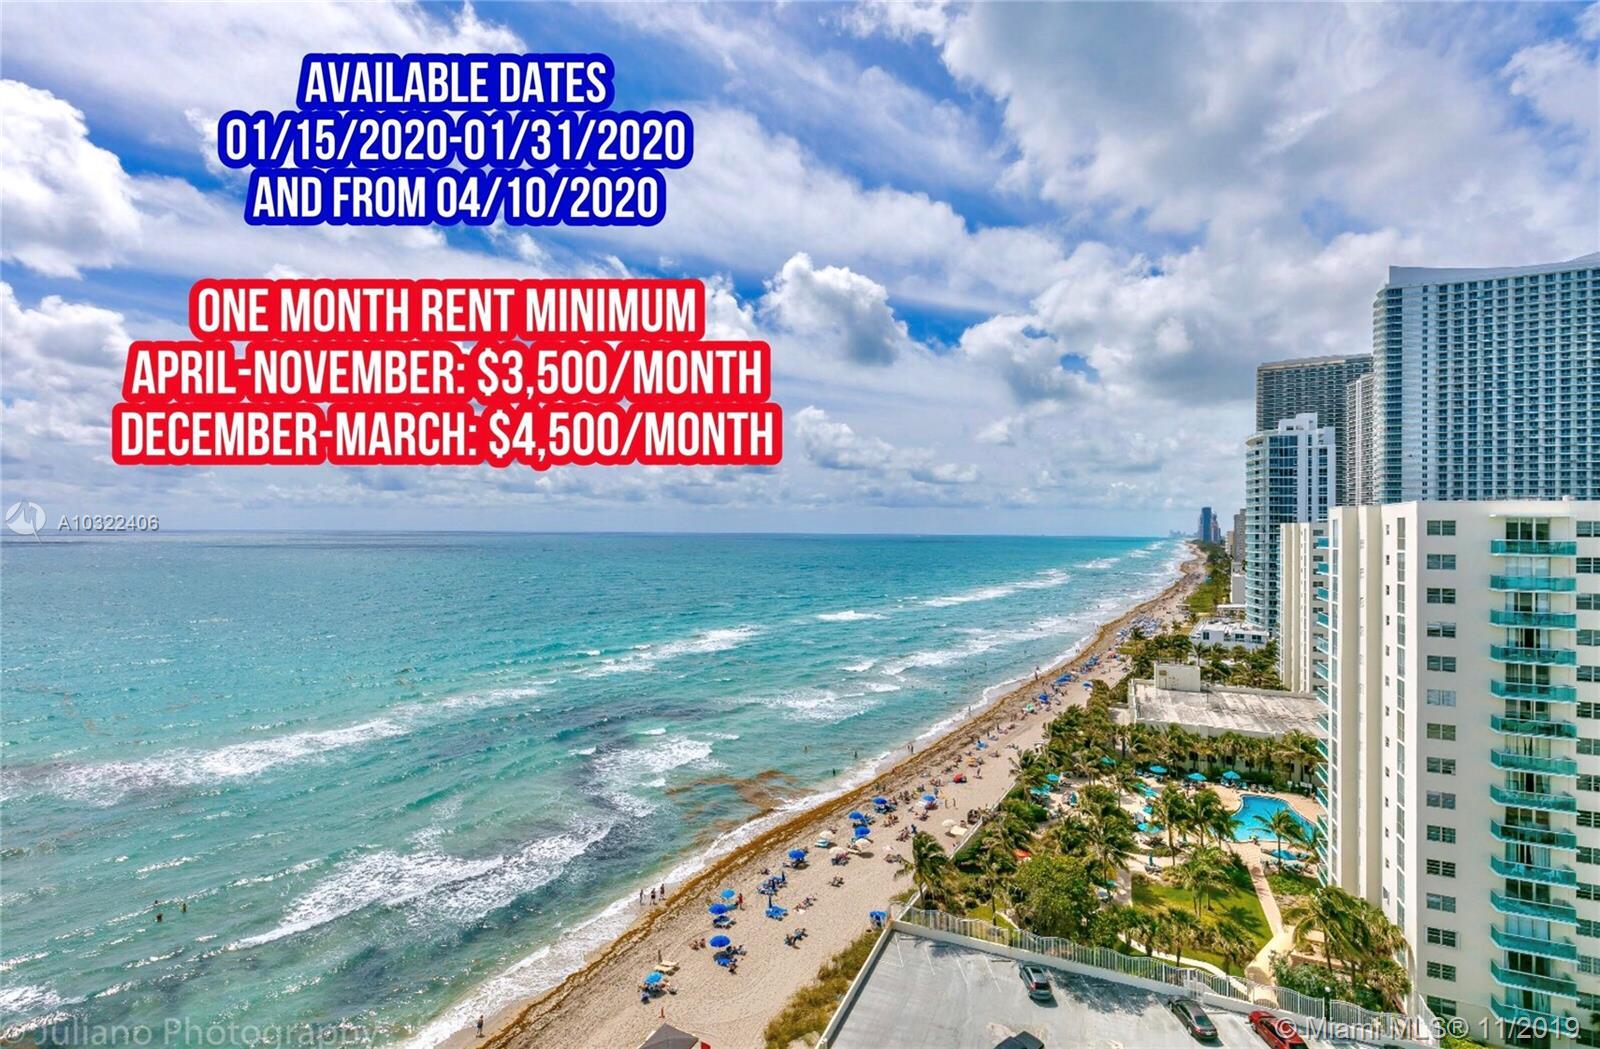 3725 S Ocean Dr #1604 For Sale A10322406, FL